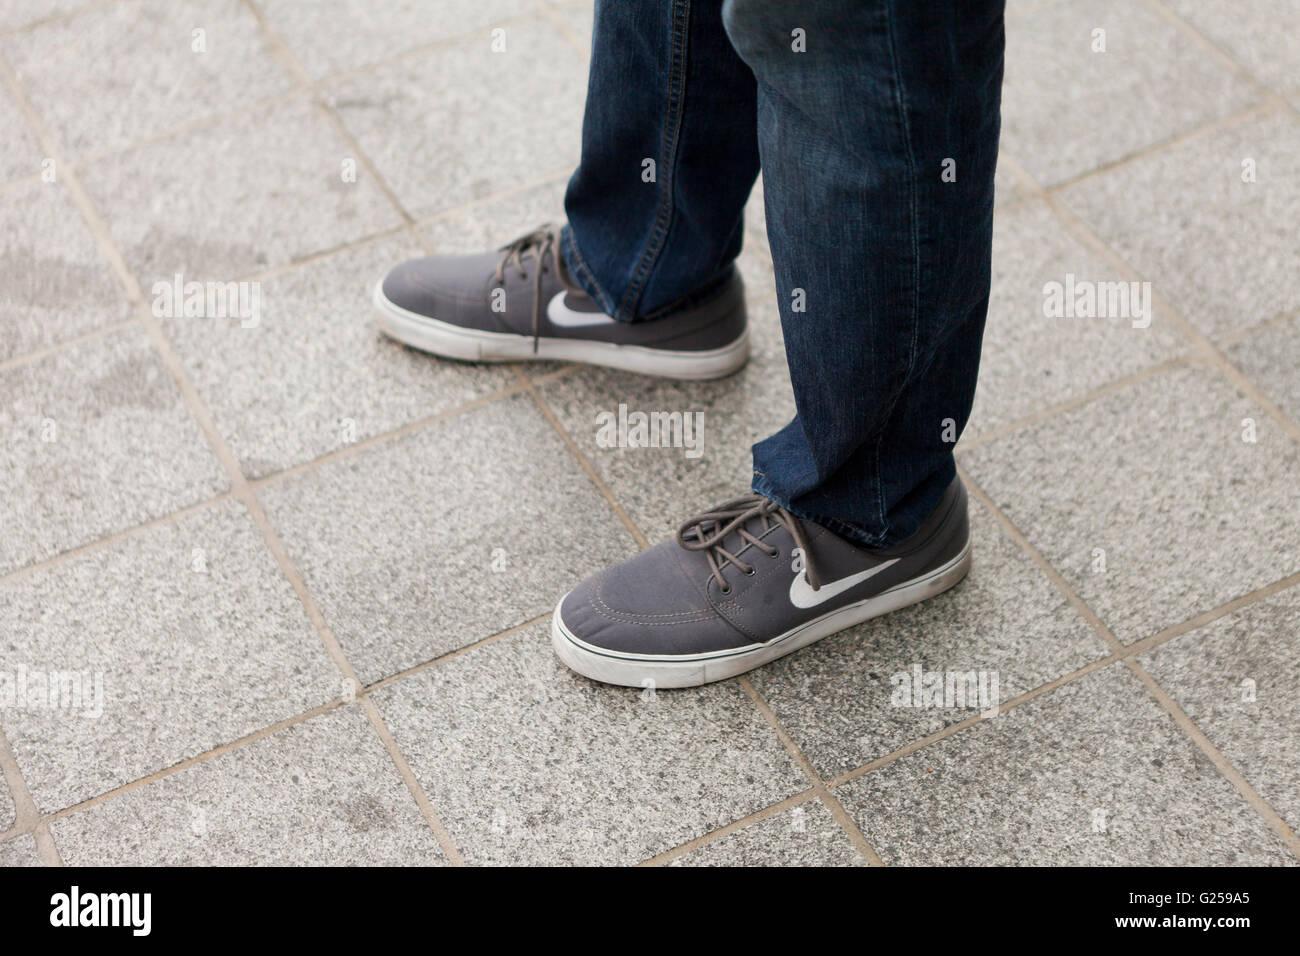 Man wearing Nike canvas shoes - USA - Stock Image